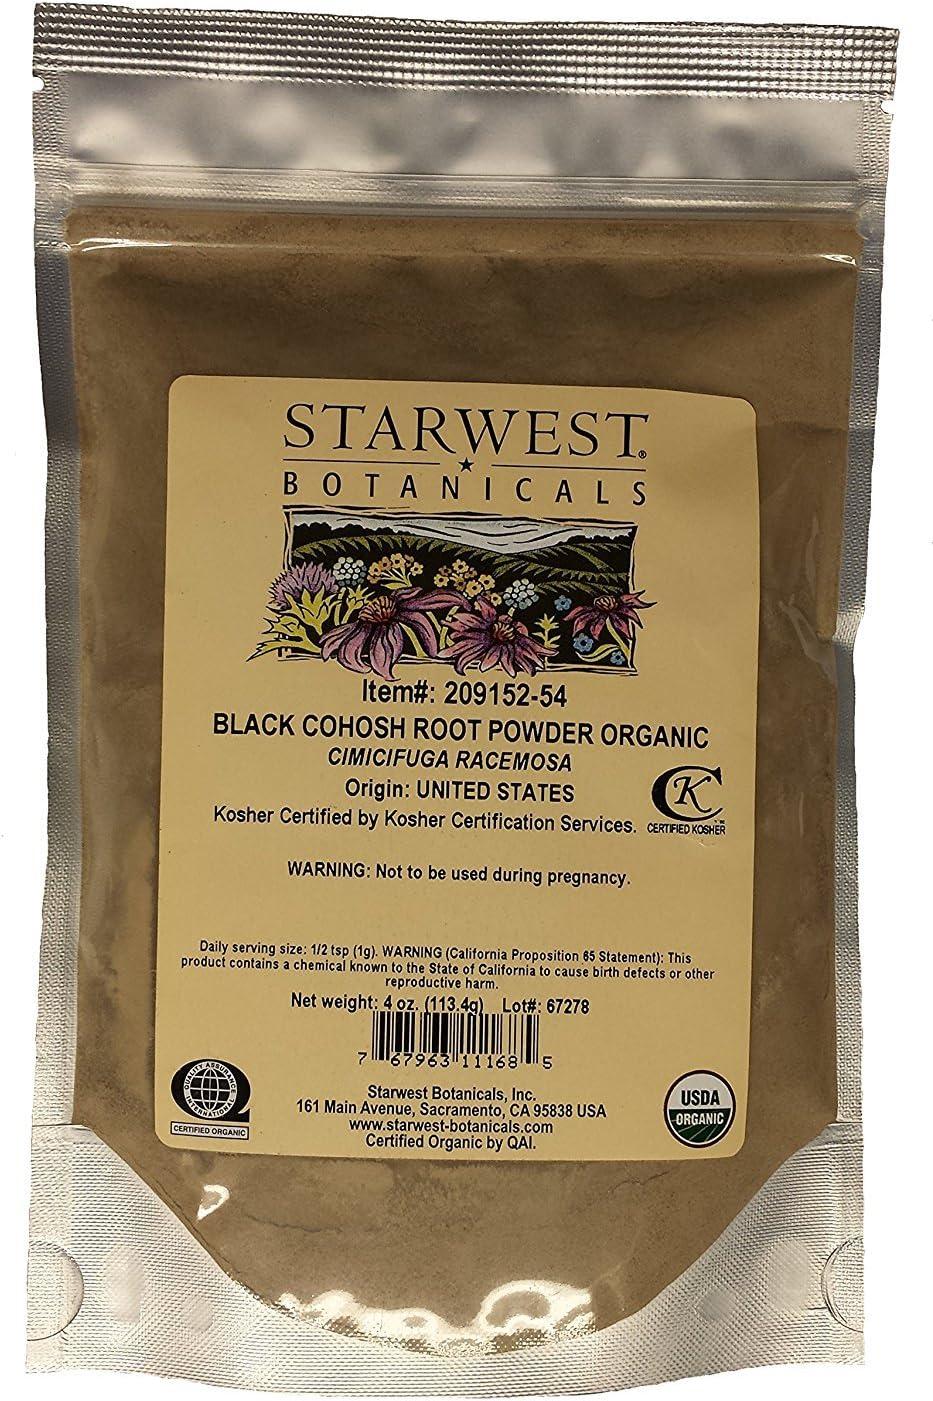 Black Cohosh Root Pwd Organic - 4 Oz,(Starwest Botanicals)